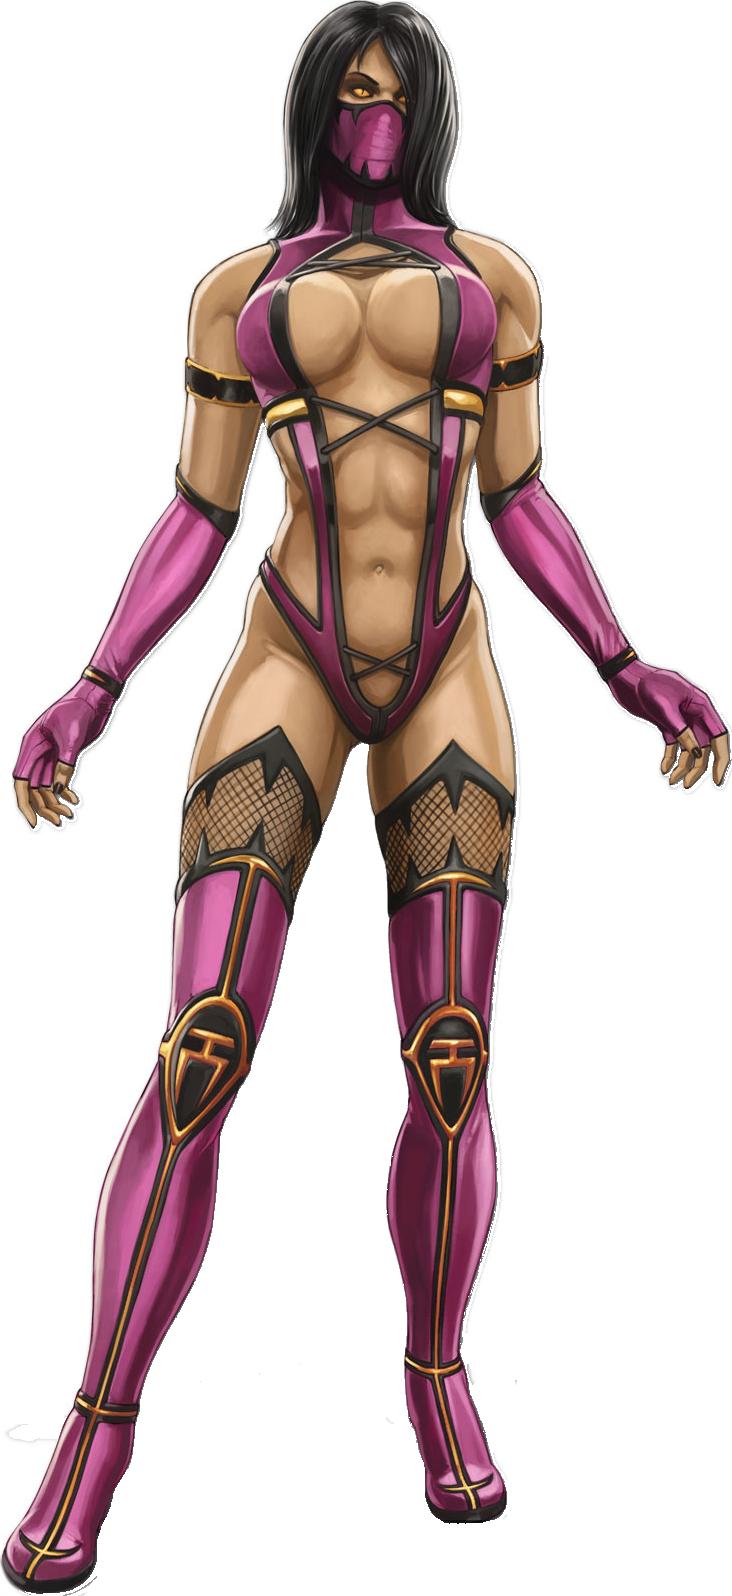 Image - Mortal Kombat Mileena.png | Death Battle Fanon ...